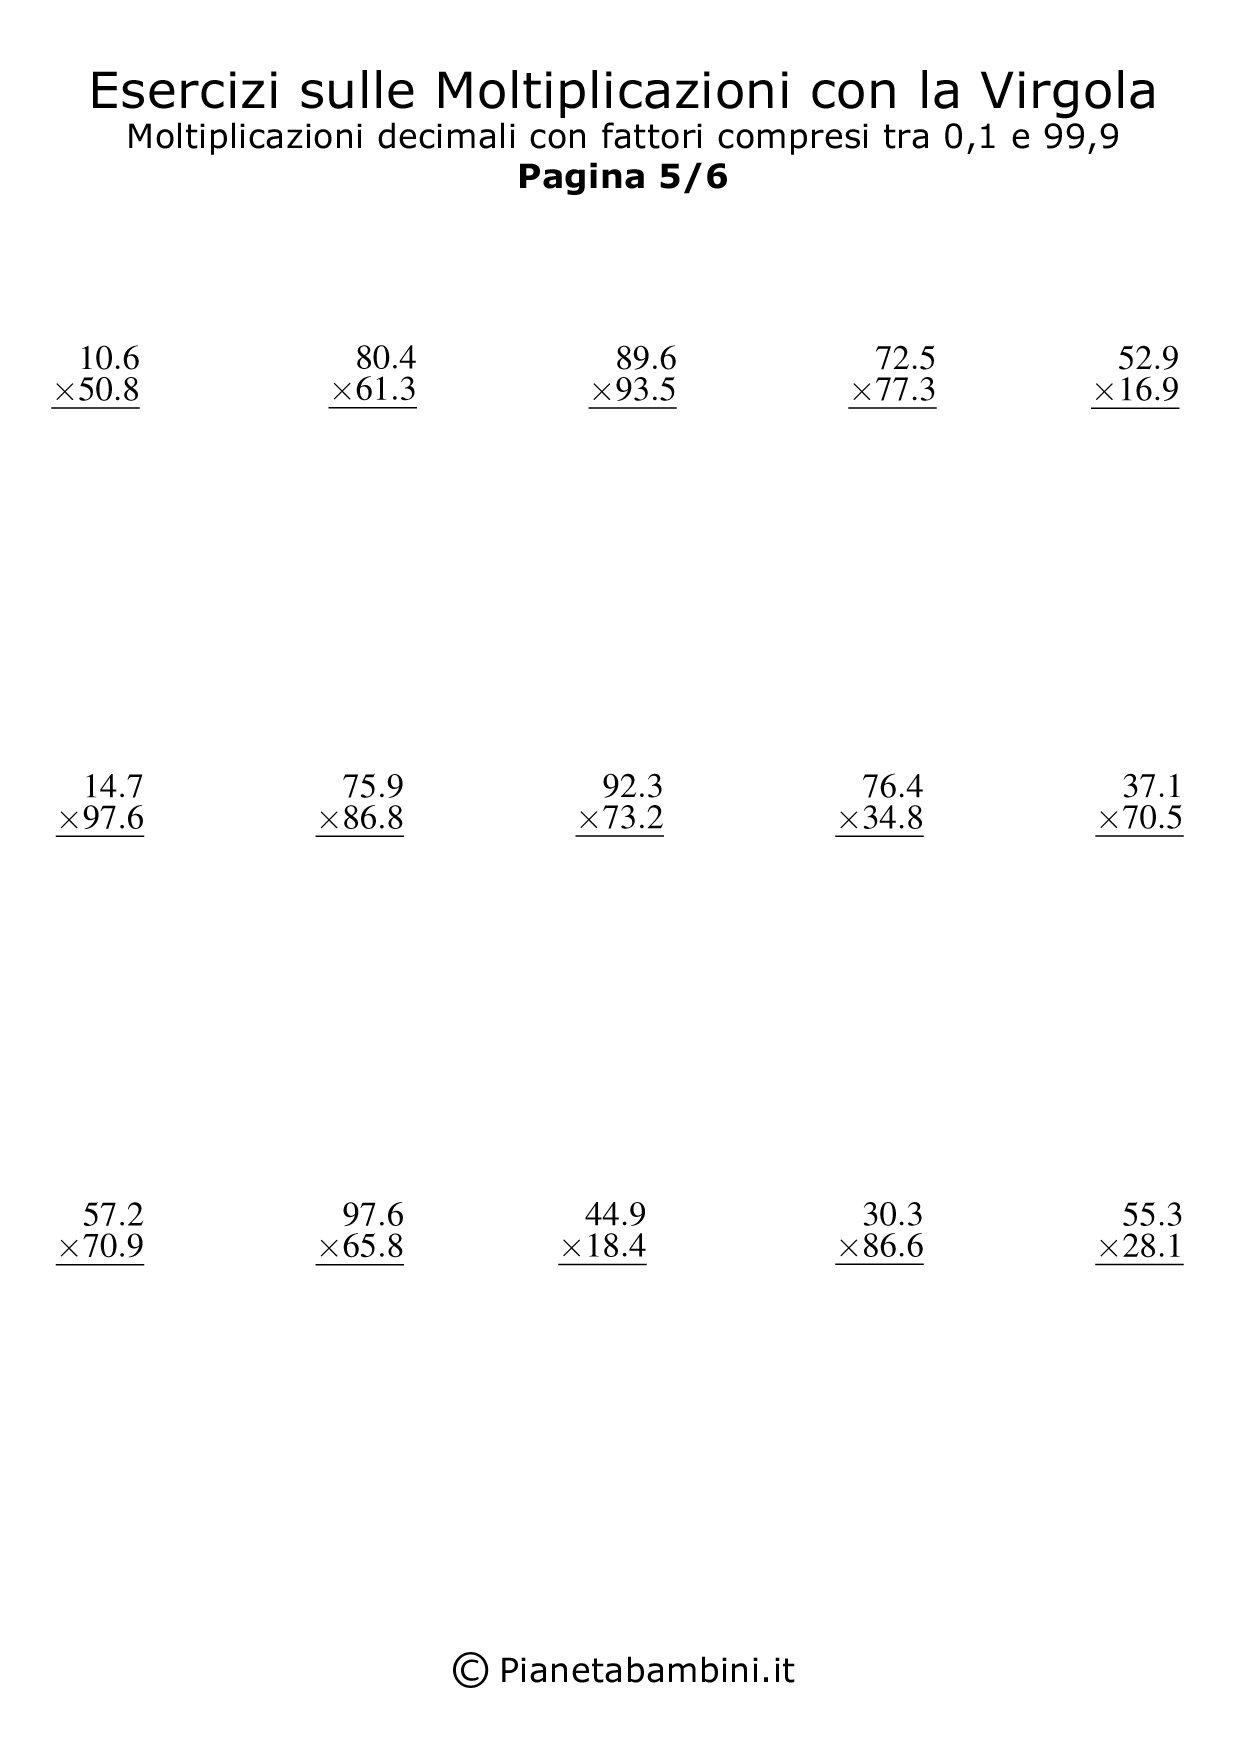 Moltiplicazioni-Virgola-0.1-99.9_5